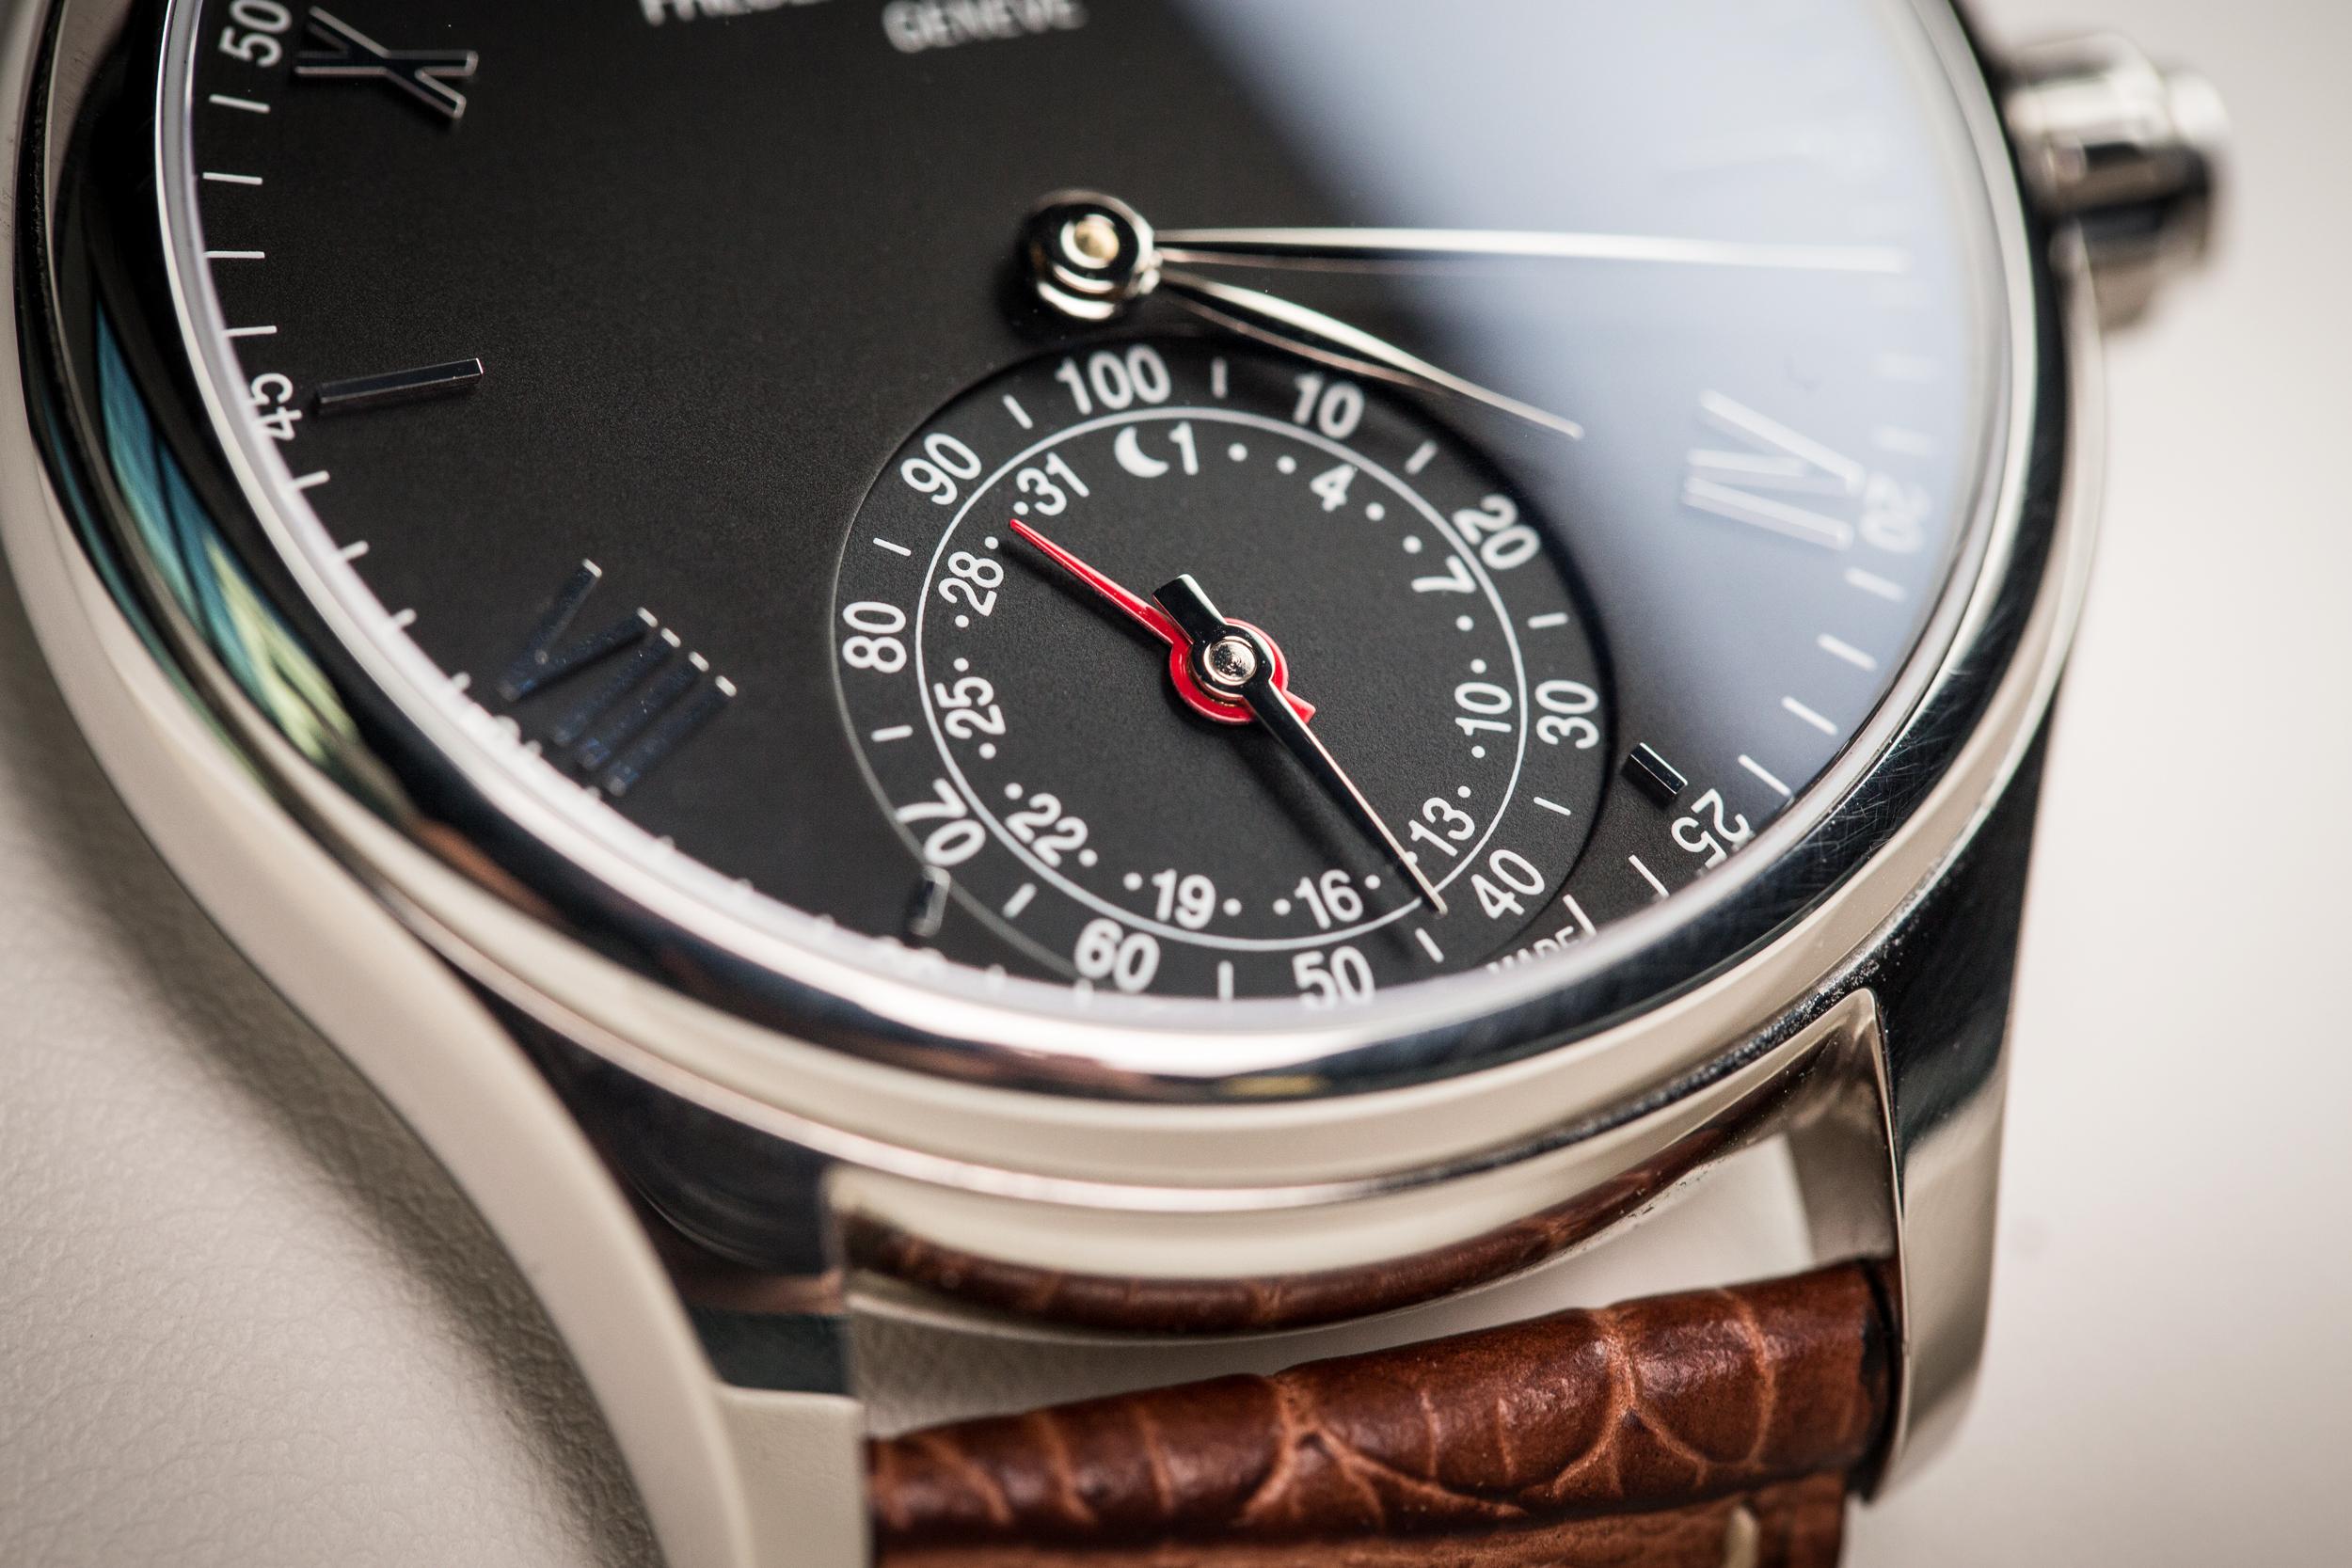 Macro shot of the Frederique Constant Smartwatch for PCWorld.com